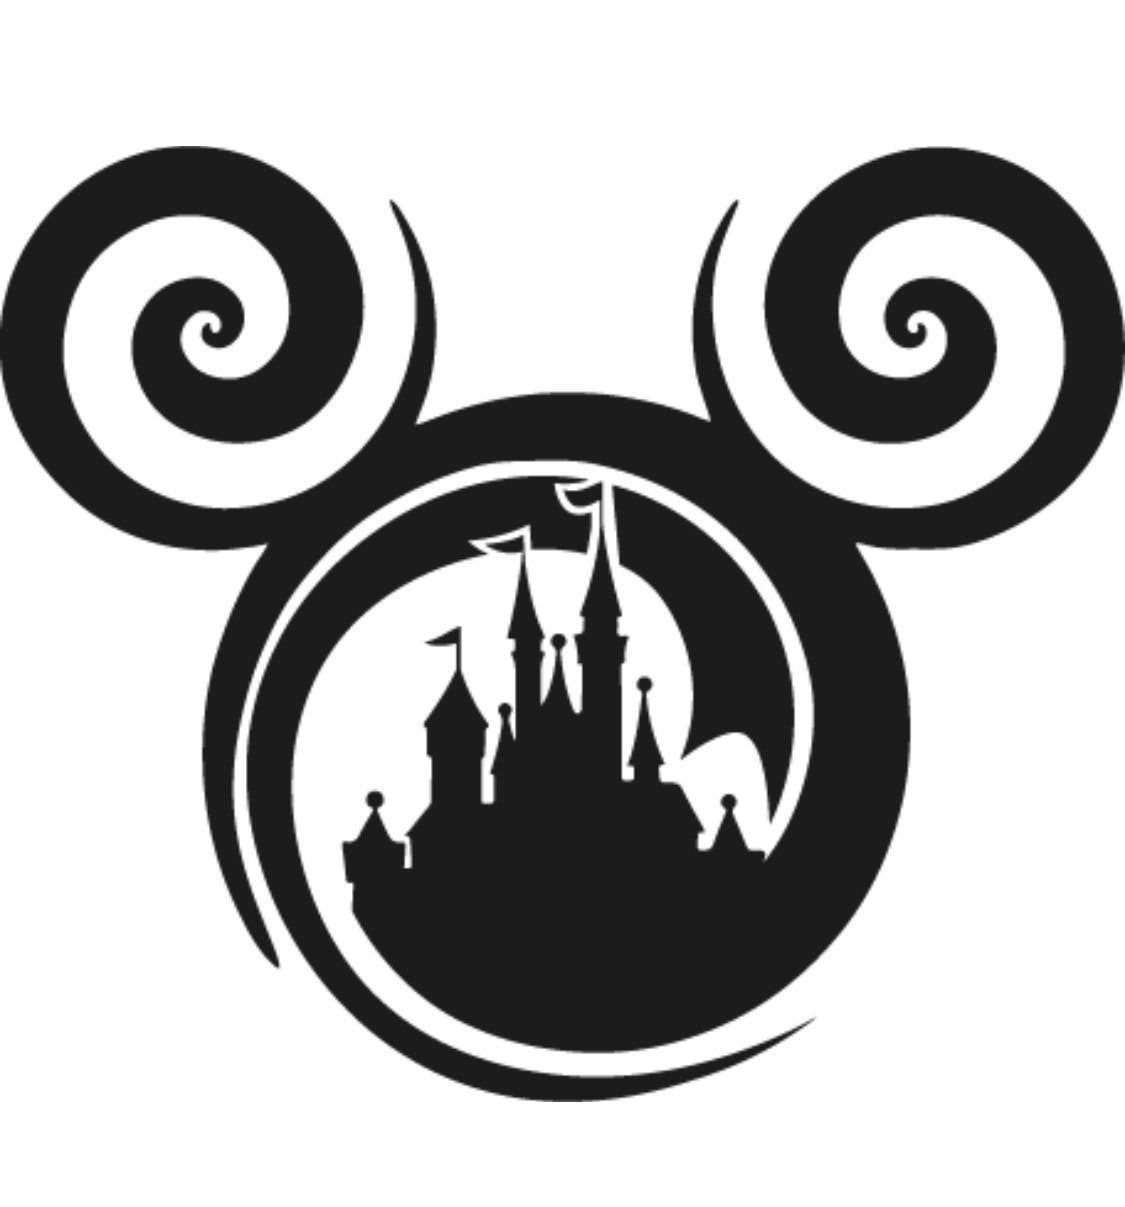 Mickey Mouse Logo in Castle Vinyl Decal-Disney